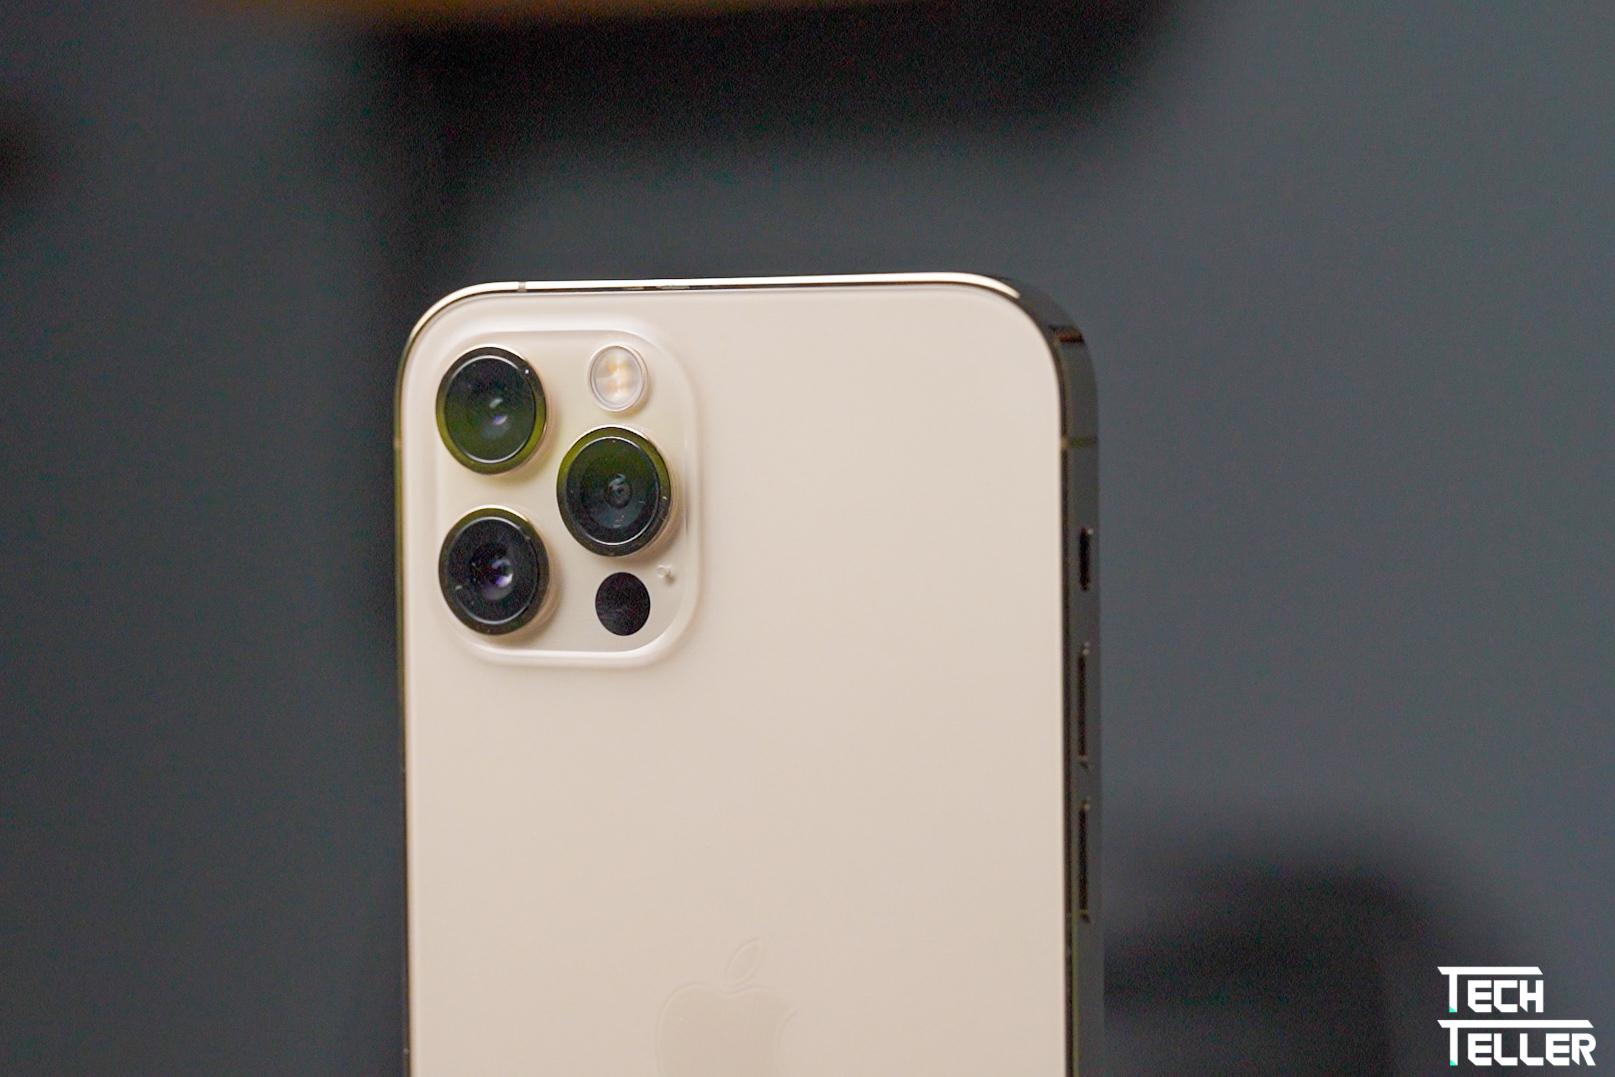 iPhone12、iPhone 12 Pro天差地遠?相機多模式直球對決,夜拍模式超香 快速開箱feat. iPhone 11 Pro、Samsung Galaxy S20+